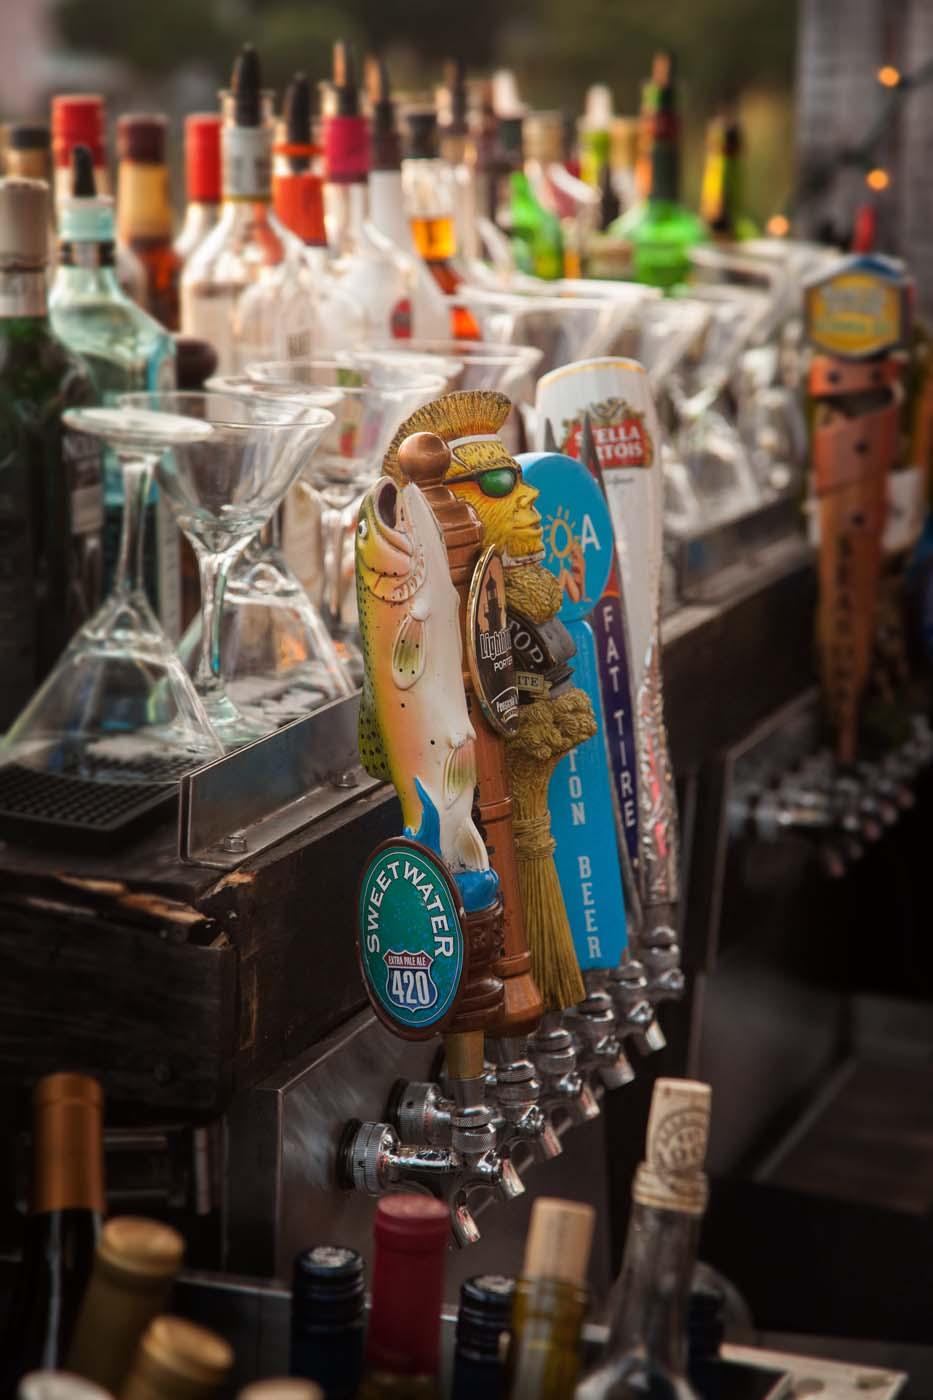 Uncle Ernies Sunset Martini Bar in Panama City, Florida